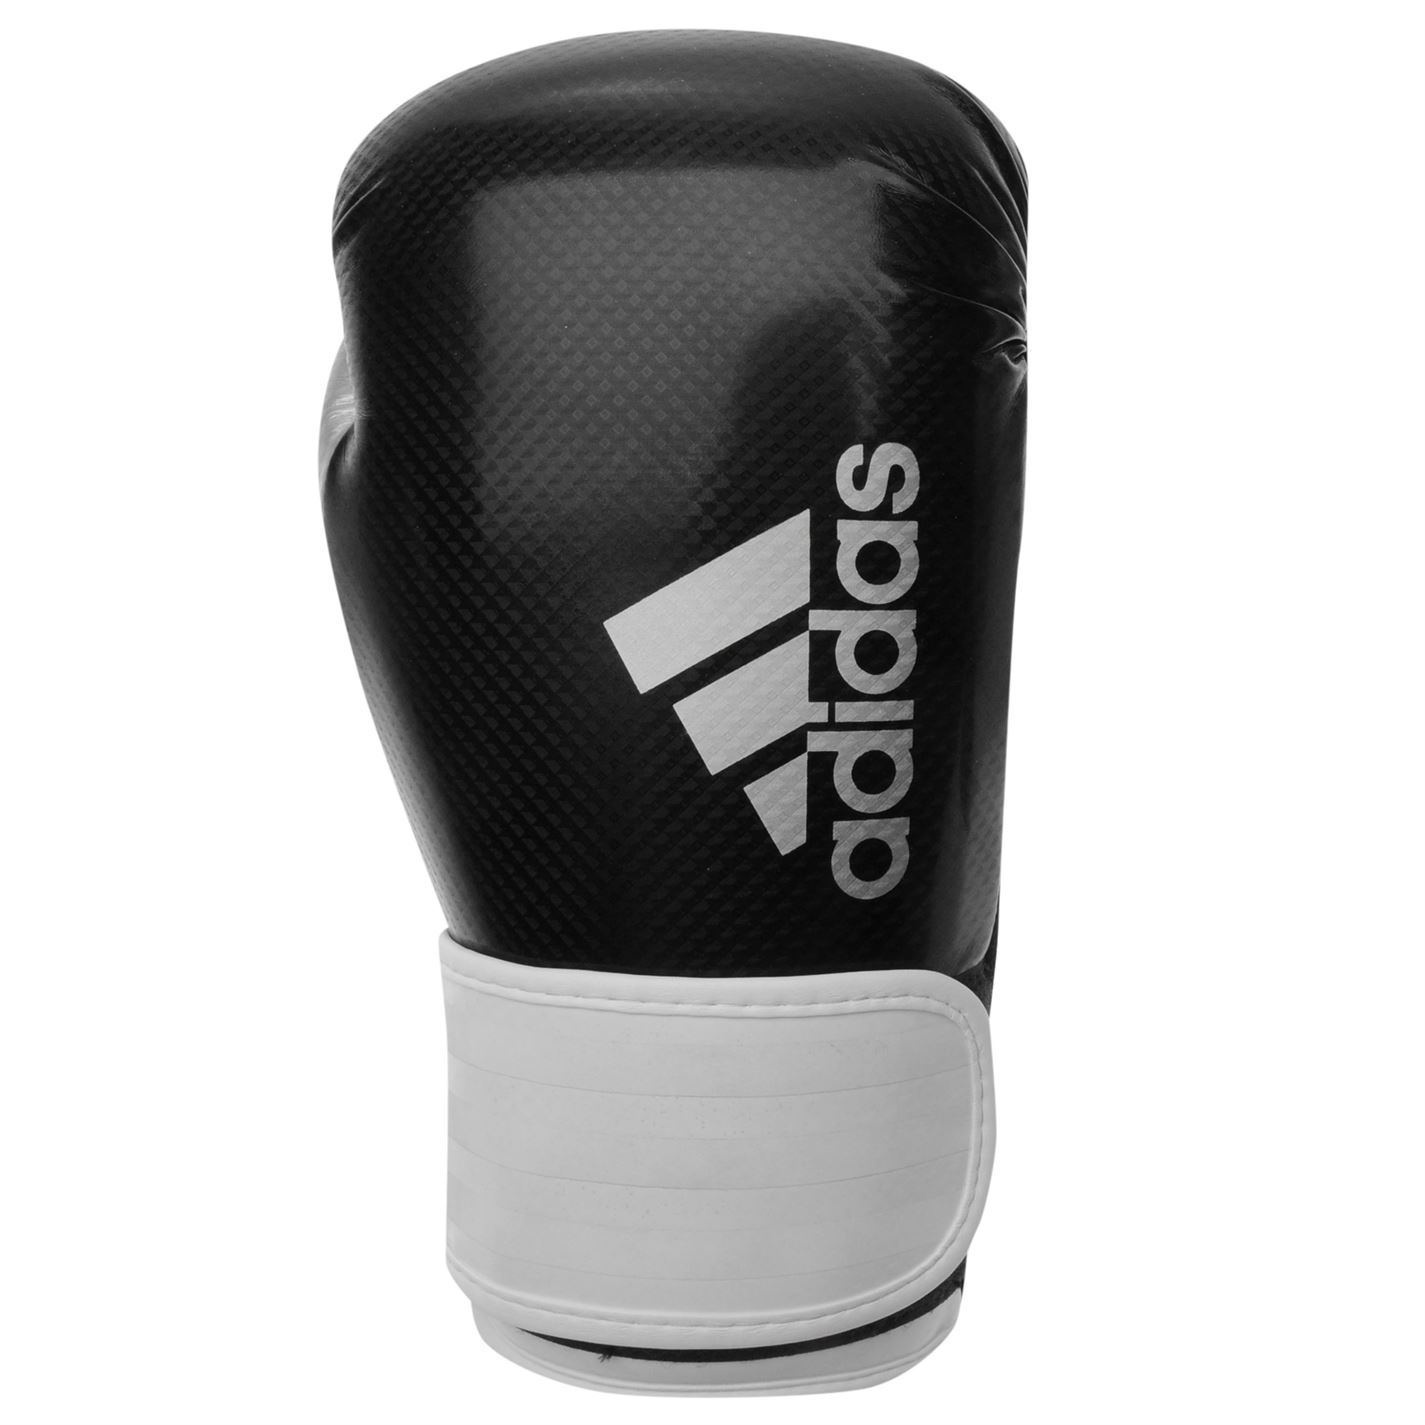 authorized site good service sale online ADIDAS HYBRID 75 Boxing Gloves Unisex ClimaCool - £35.00 ...